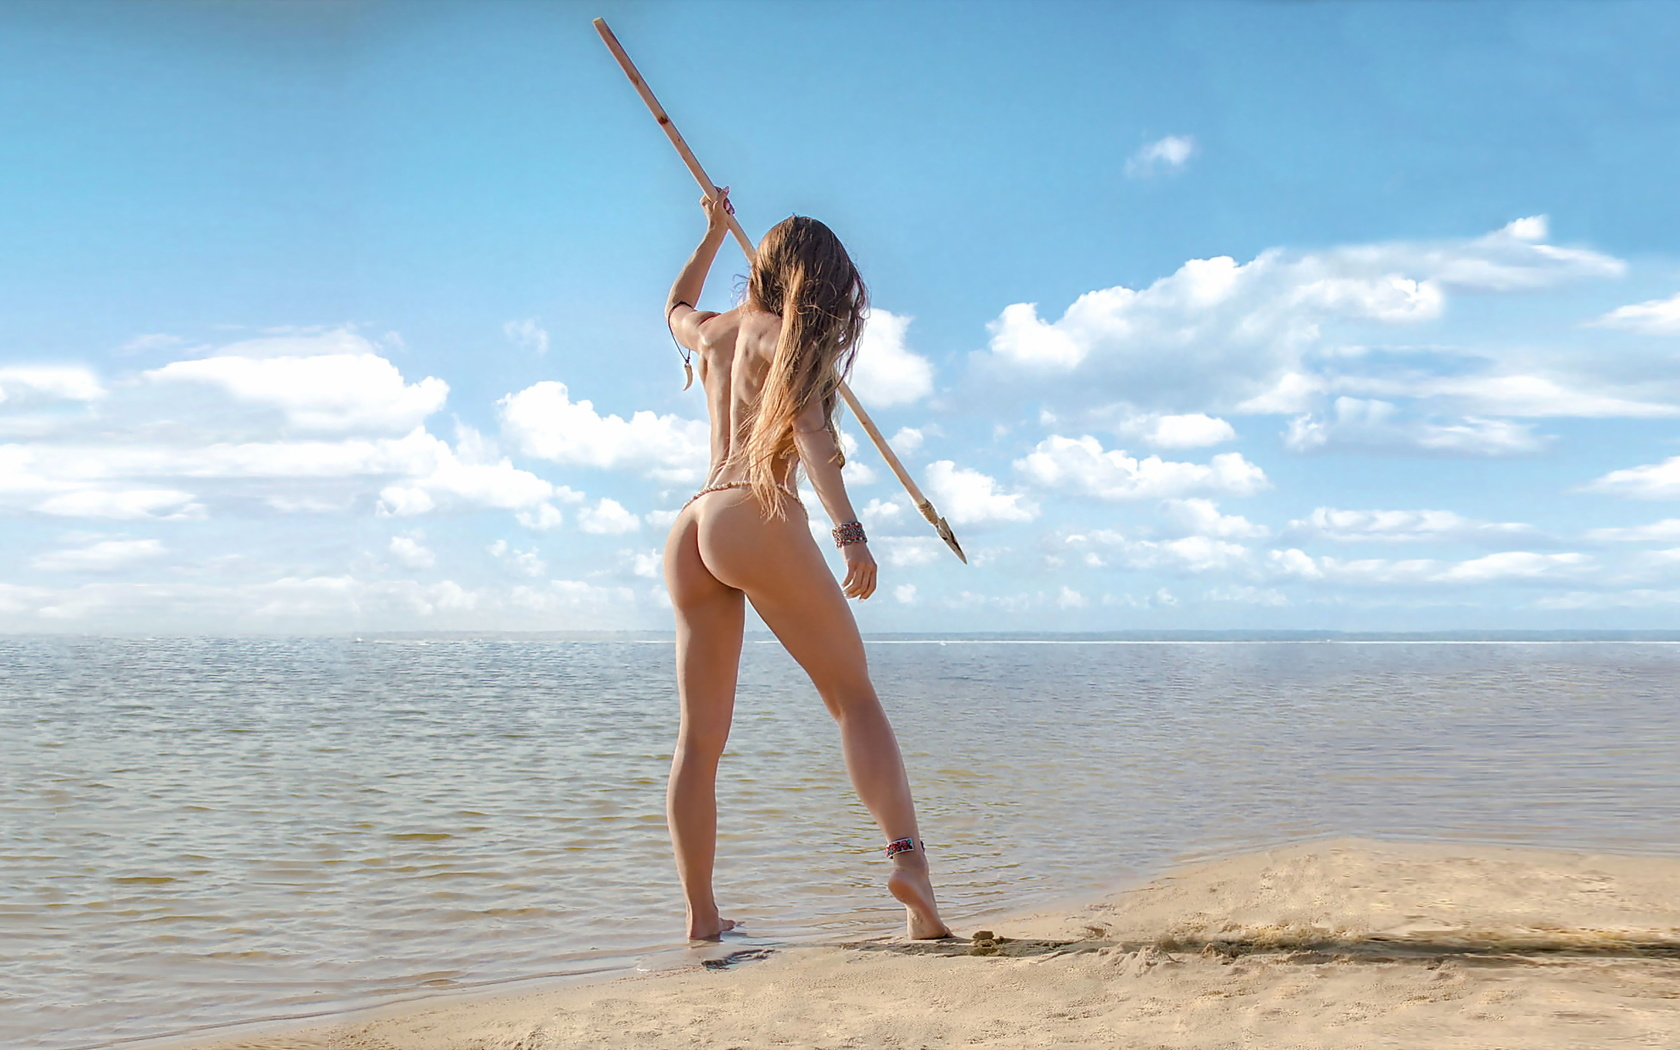 девушка, амазонка, копьё, море, вода, песок, небо, голубое